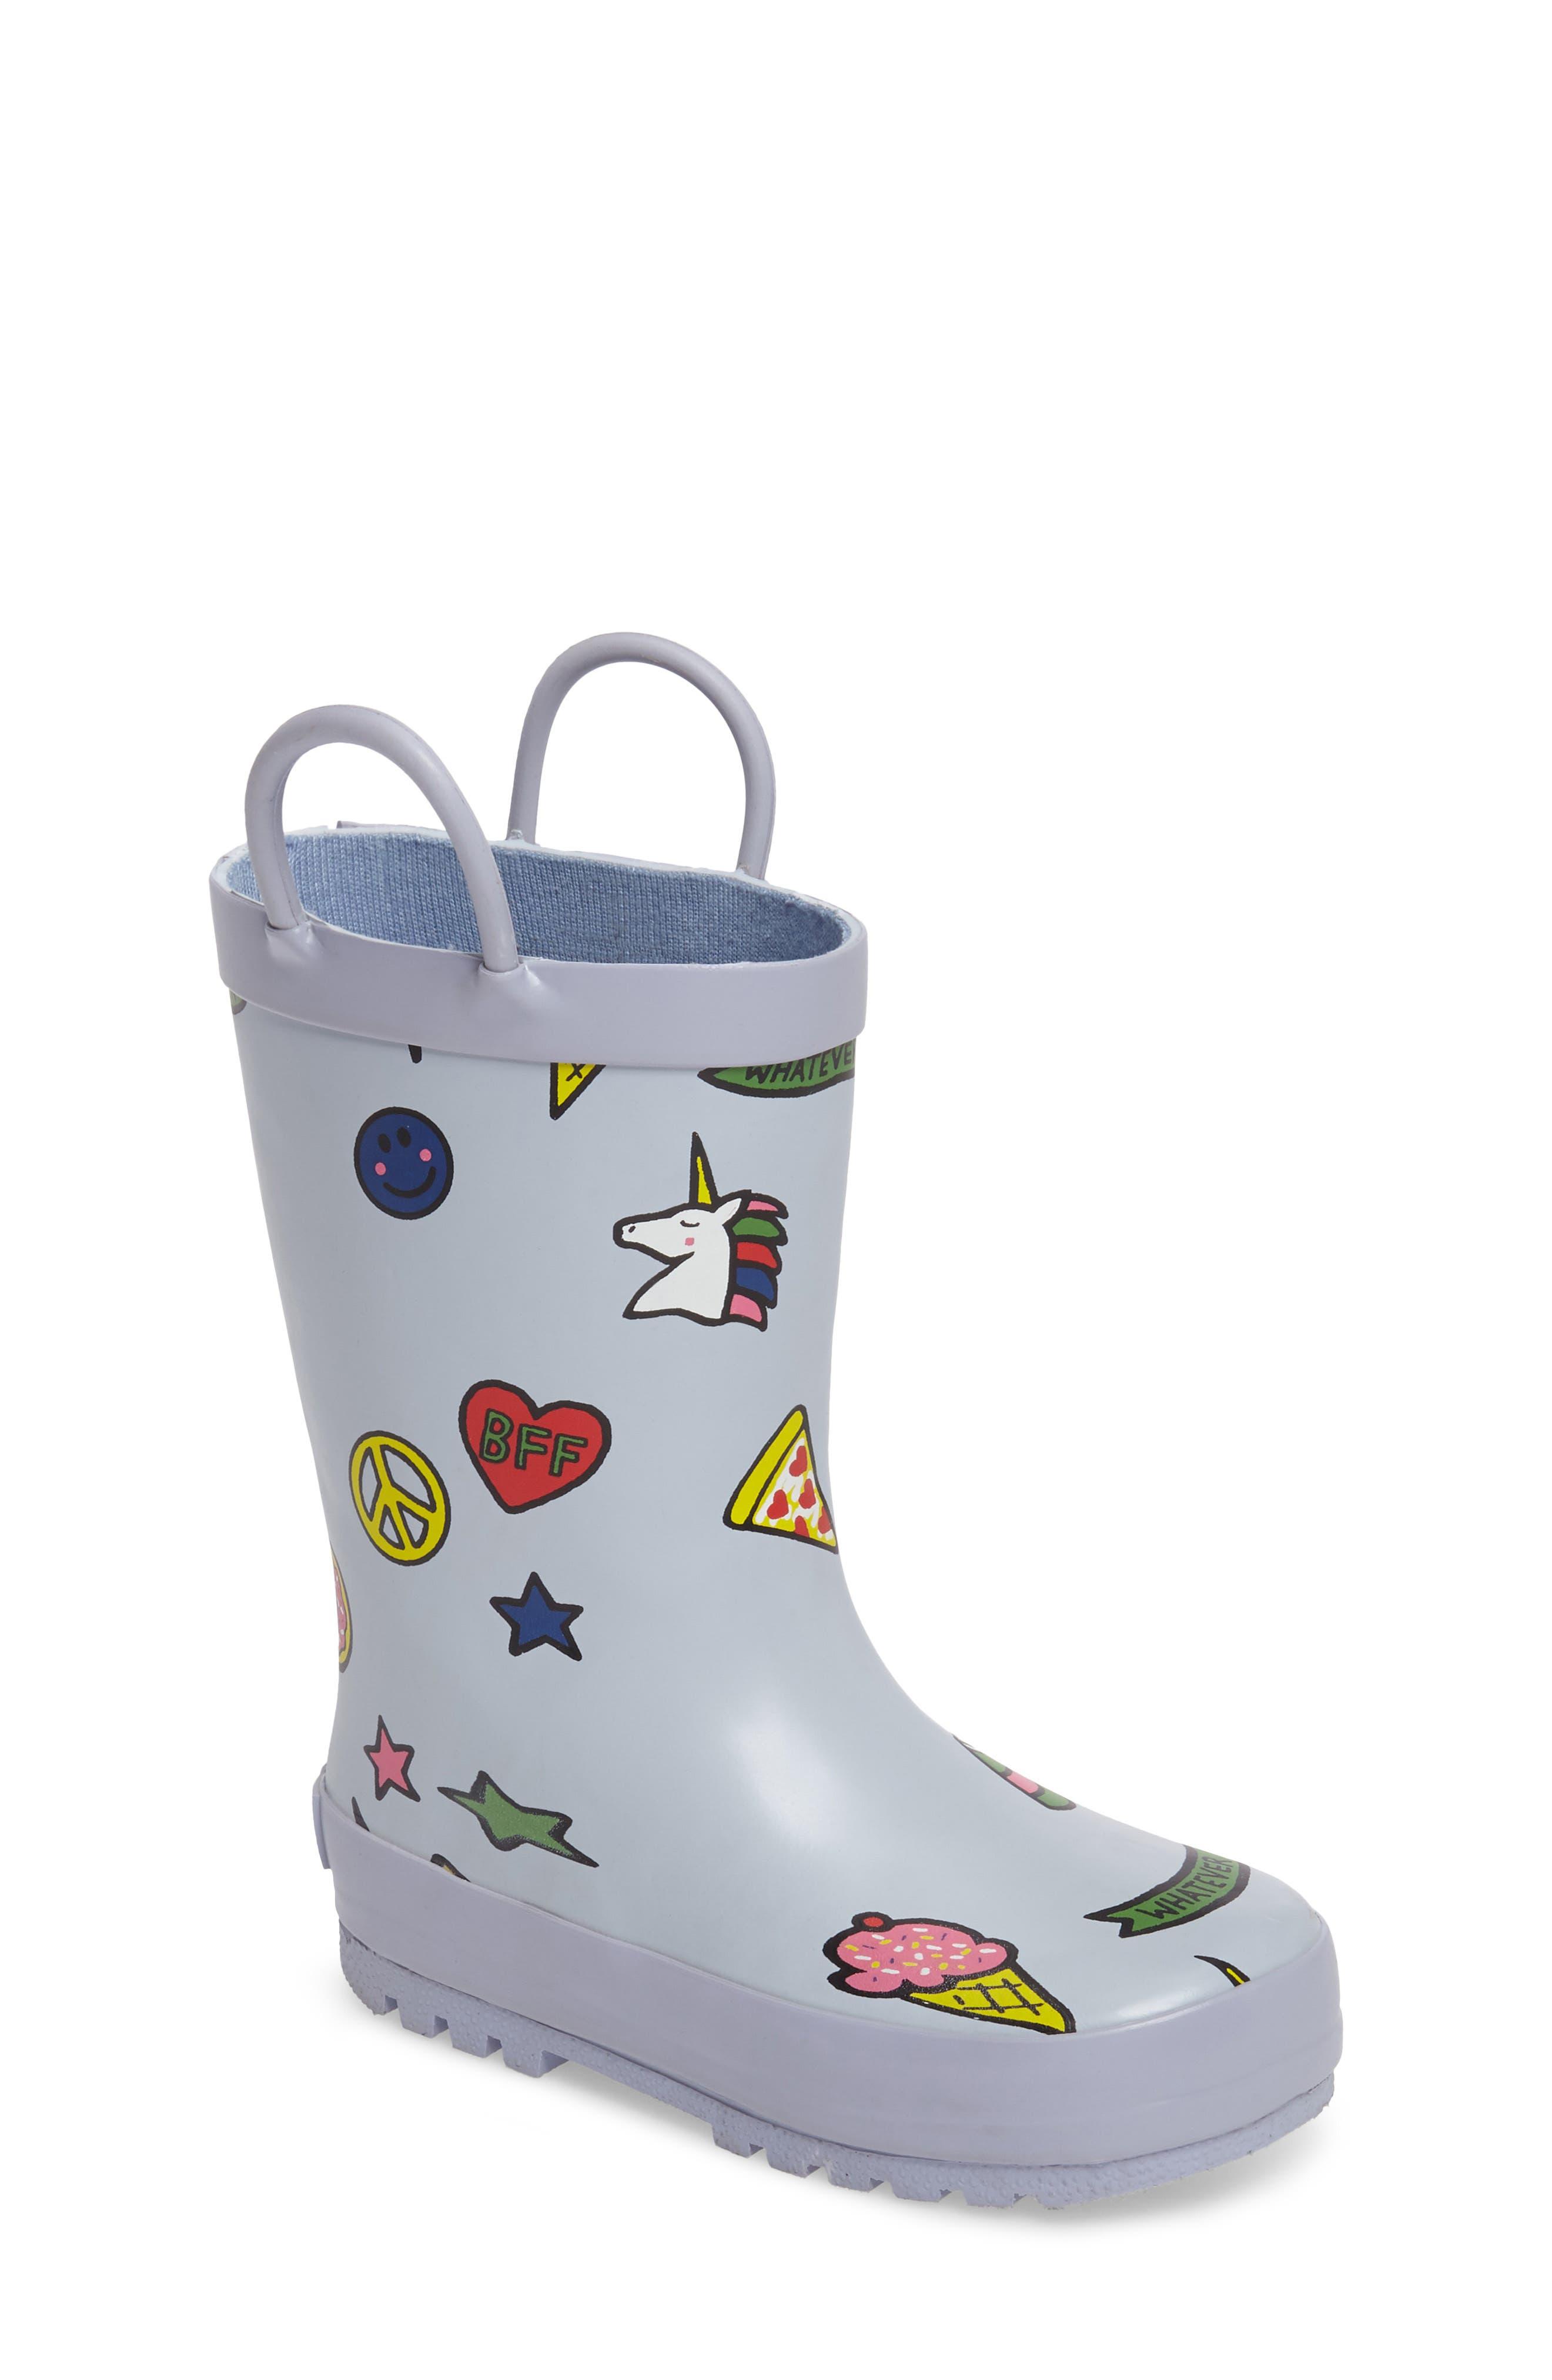 Tucker + Tate 'Puddle' Rain Boot (Walker & Toddler)